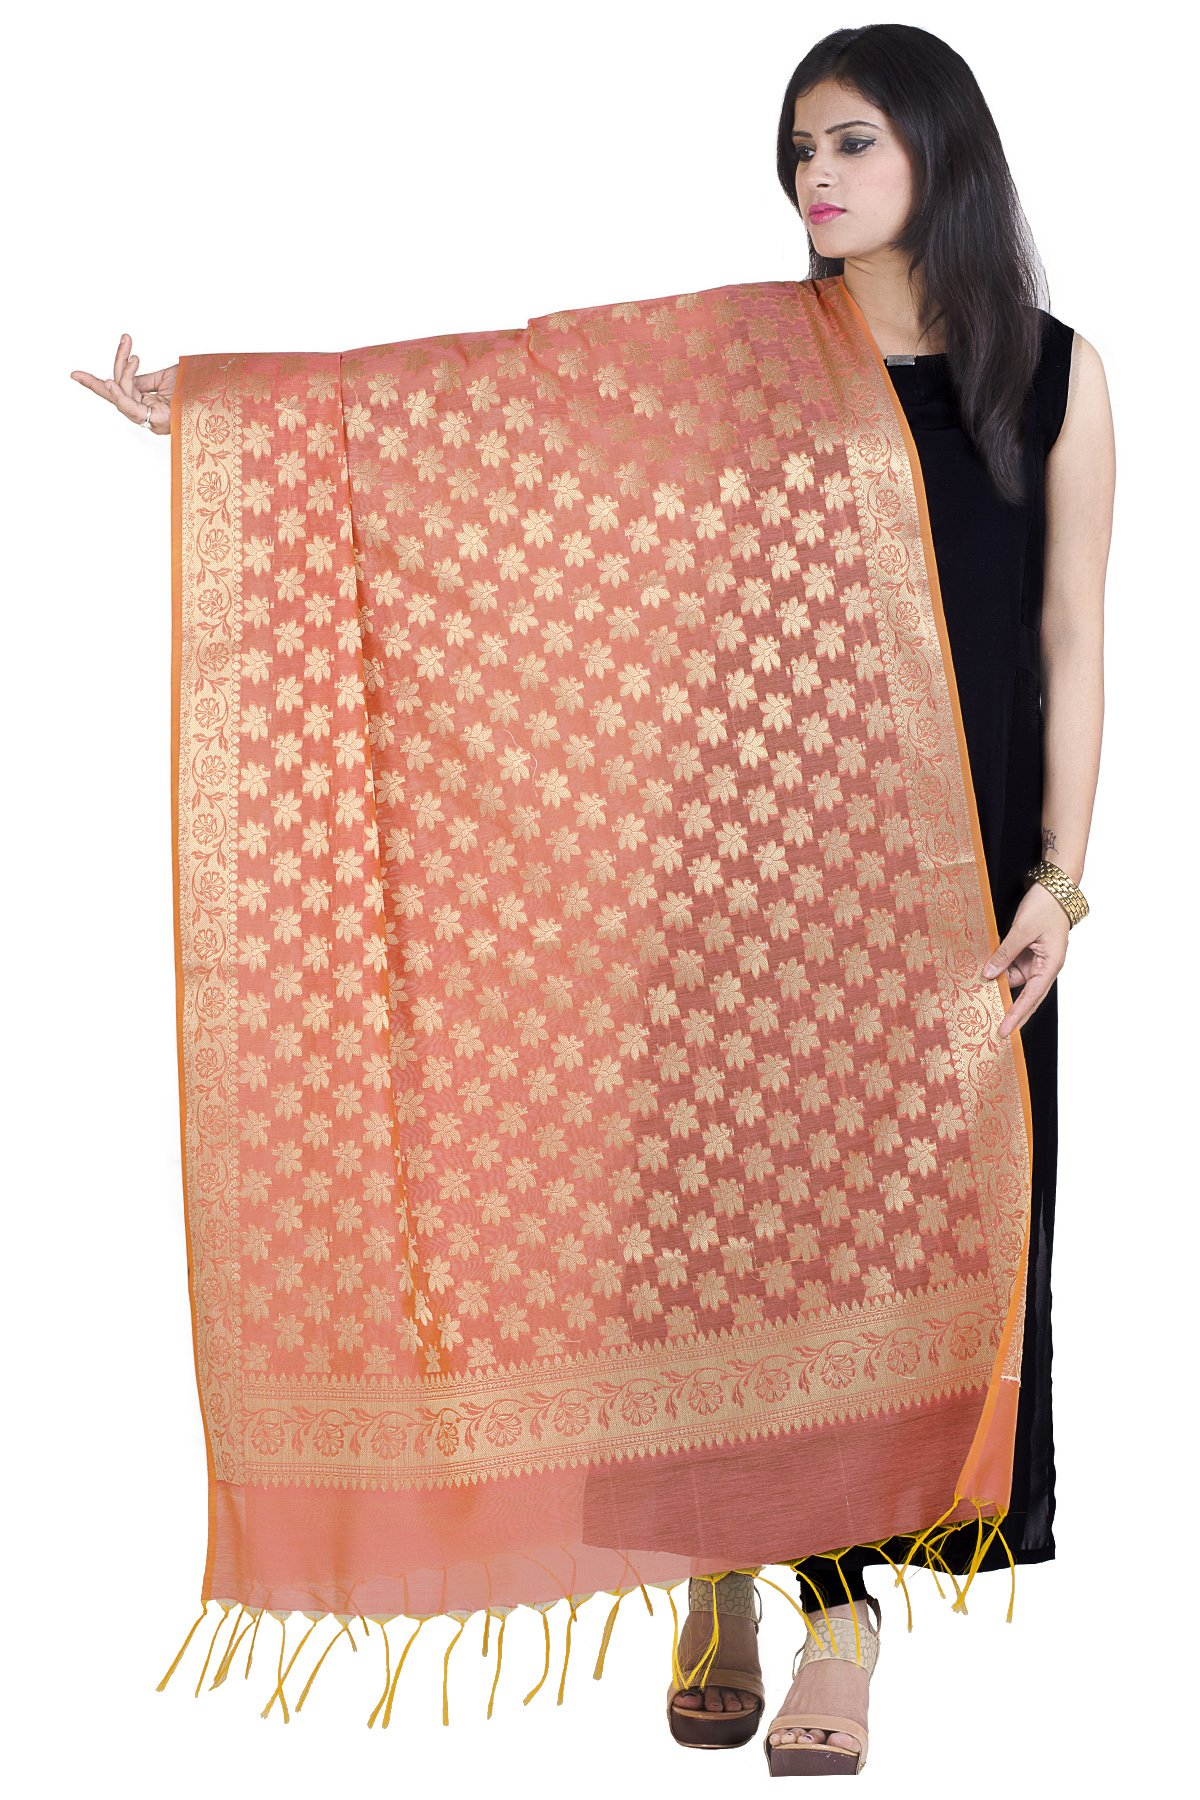 Chandrakala Women's Handwoven Zari Work Banarasi Dupatta Stole Scarf (Orange)